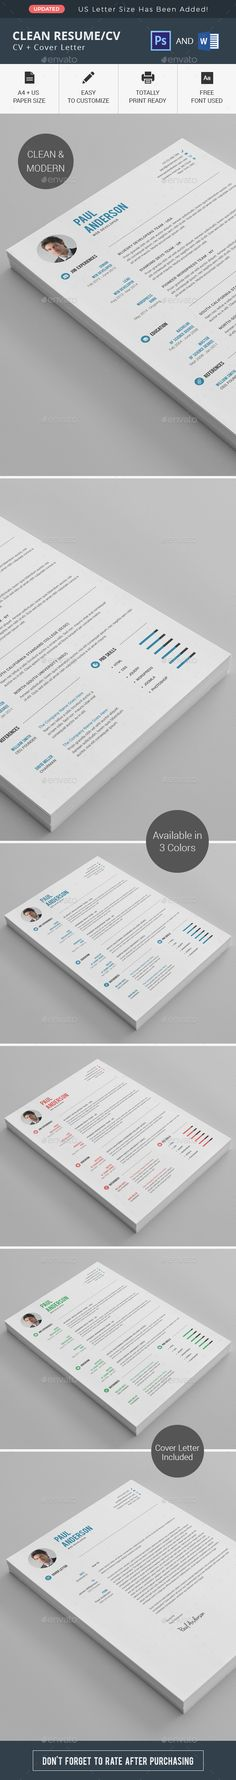 resume adobe photoshop stationery and microsoft